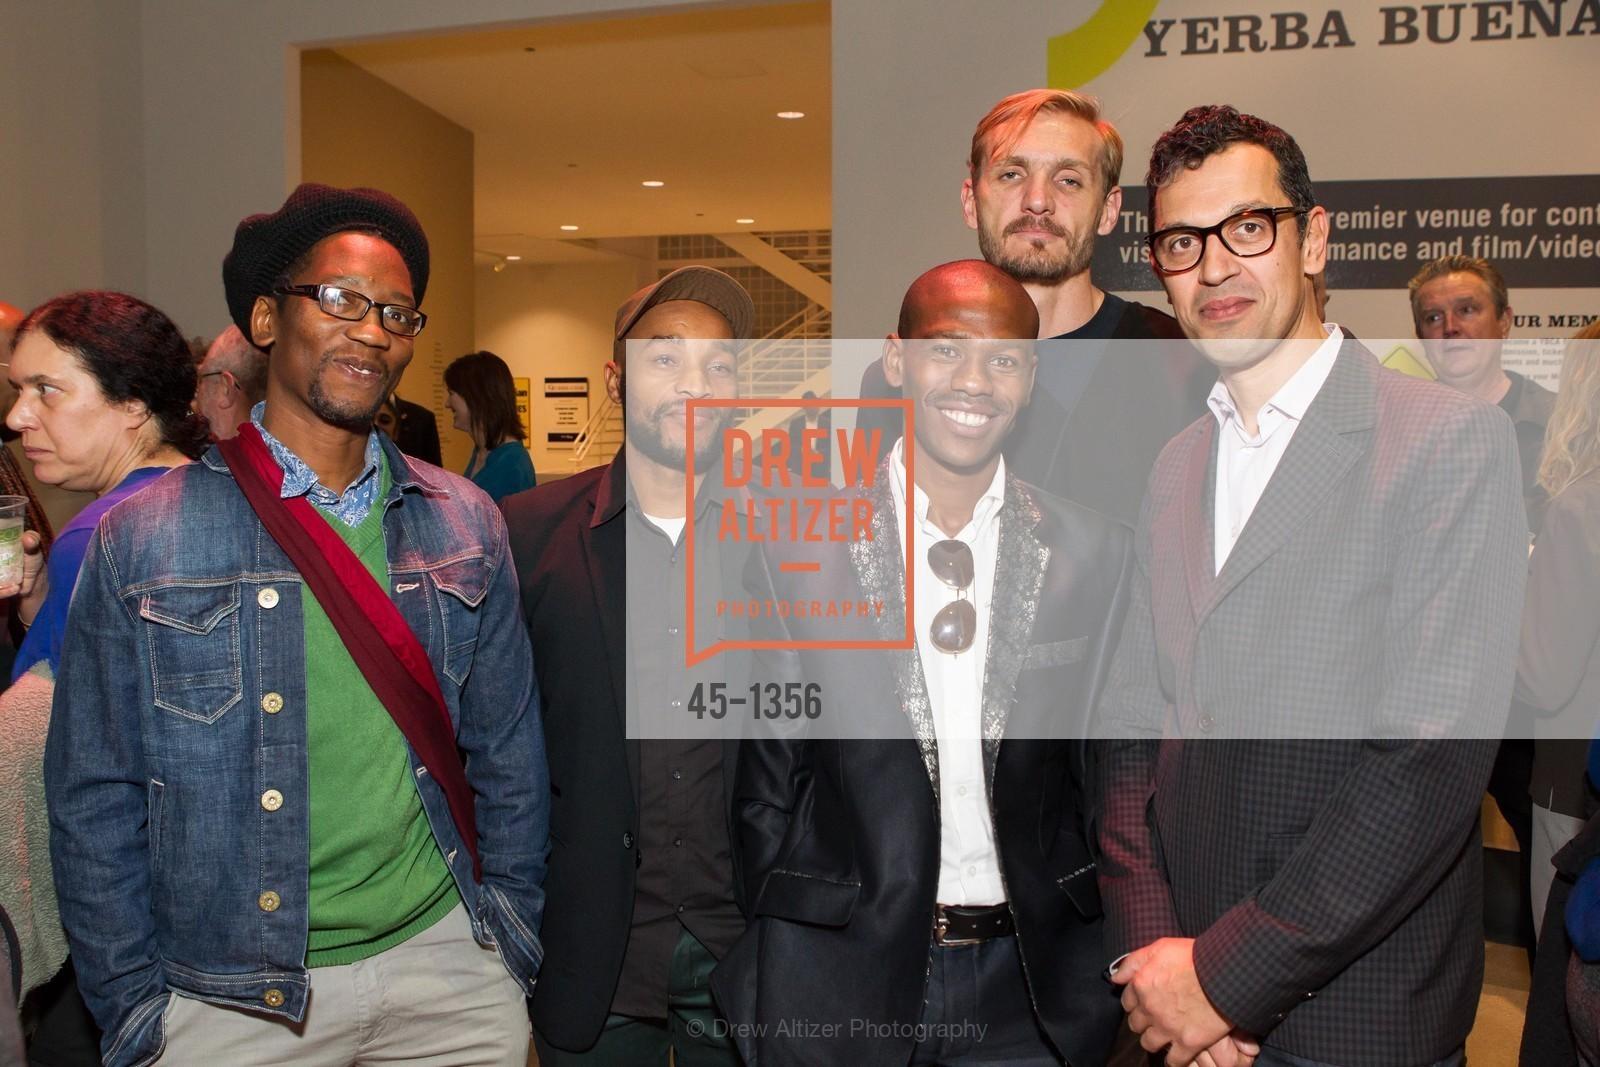 Sello Pesa, Humphrey Maleka, Erian Ntsmpu, Vaughn Sadie, Dominic Willston, Photo #45-1356